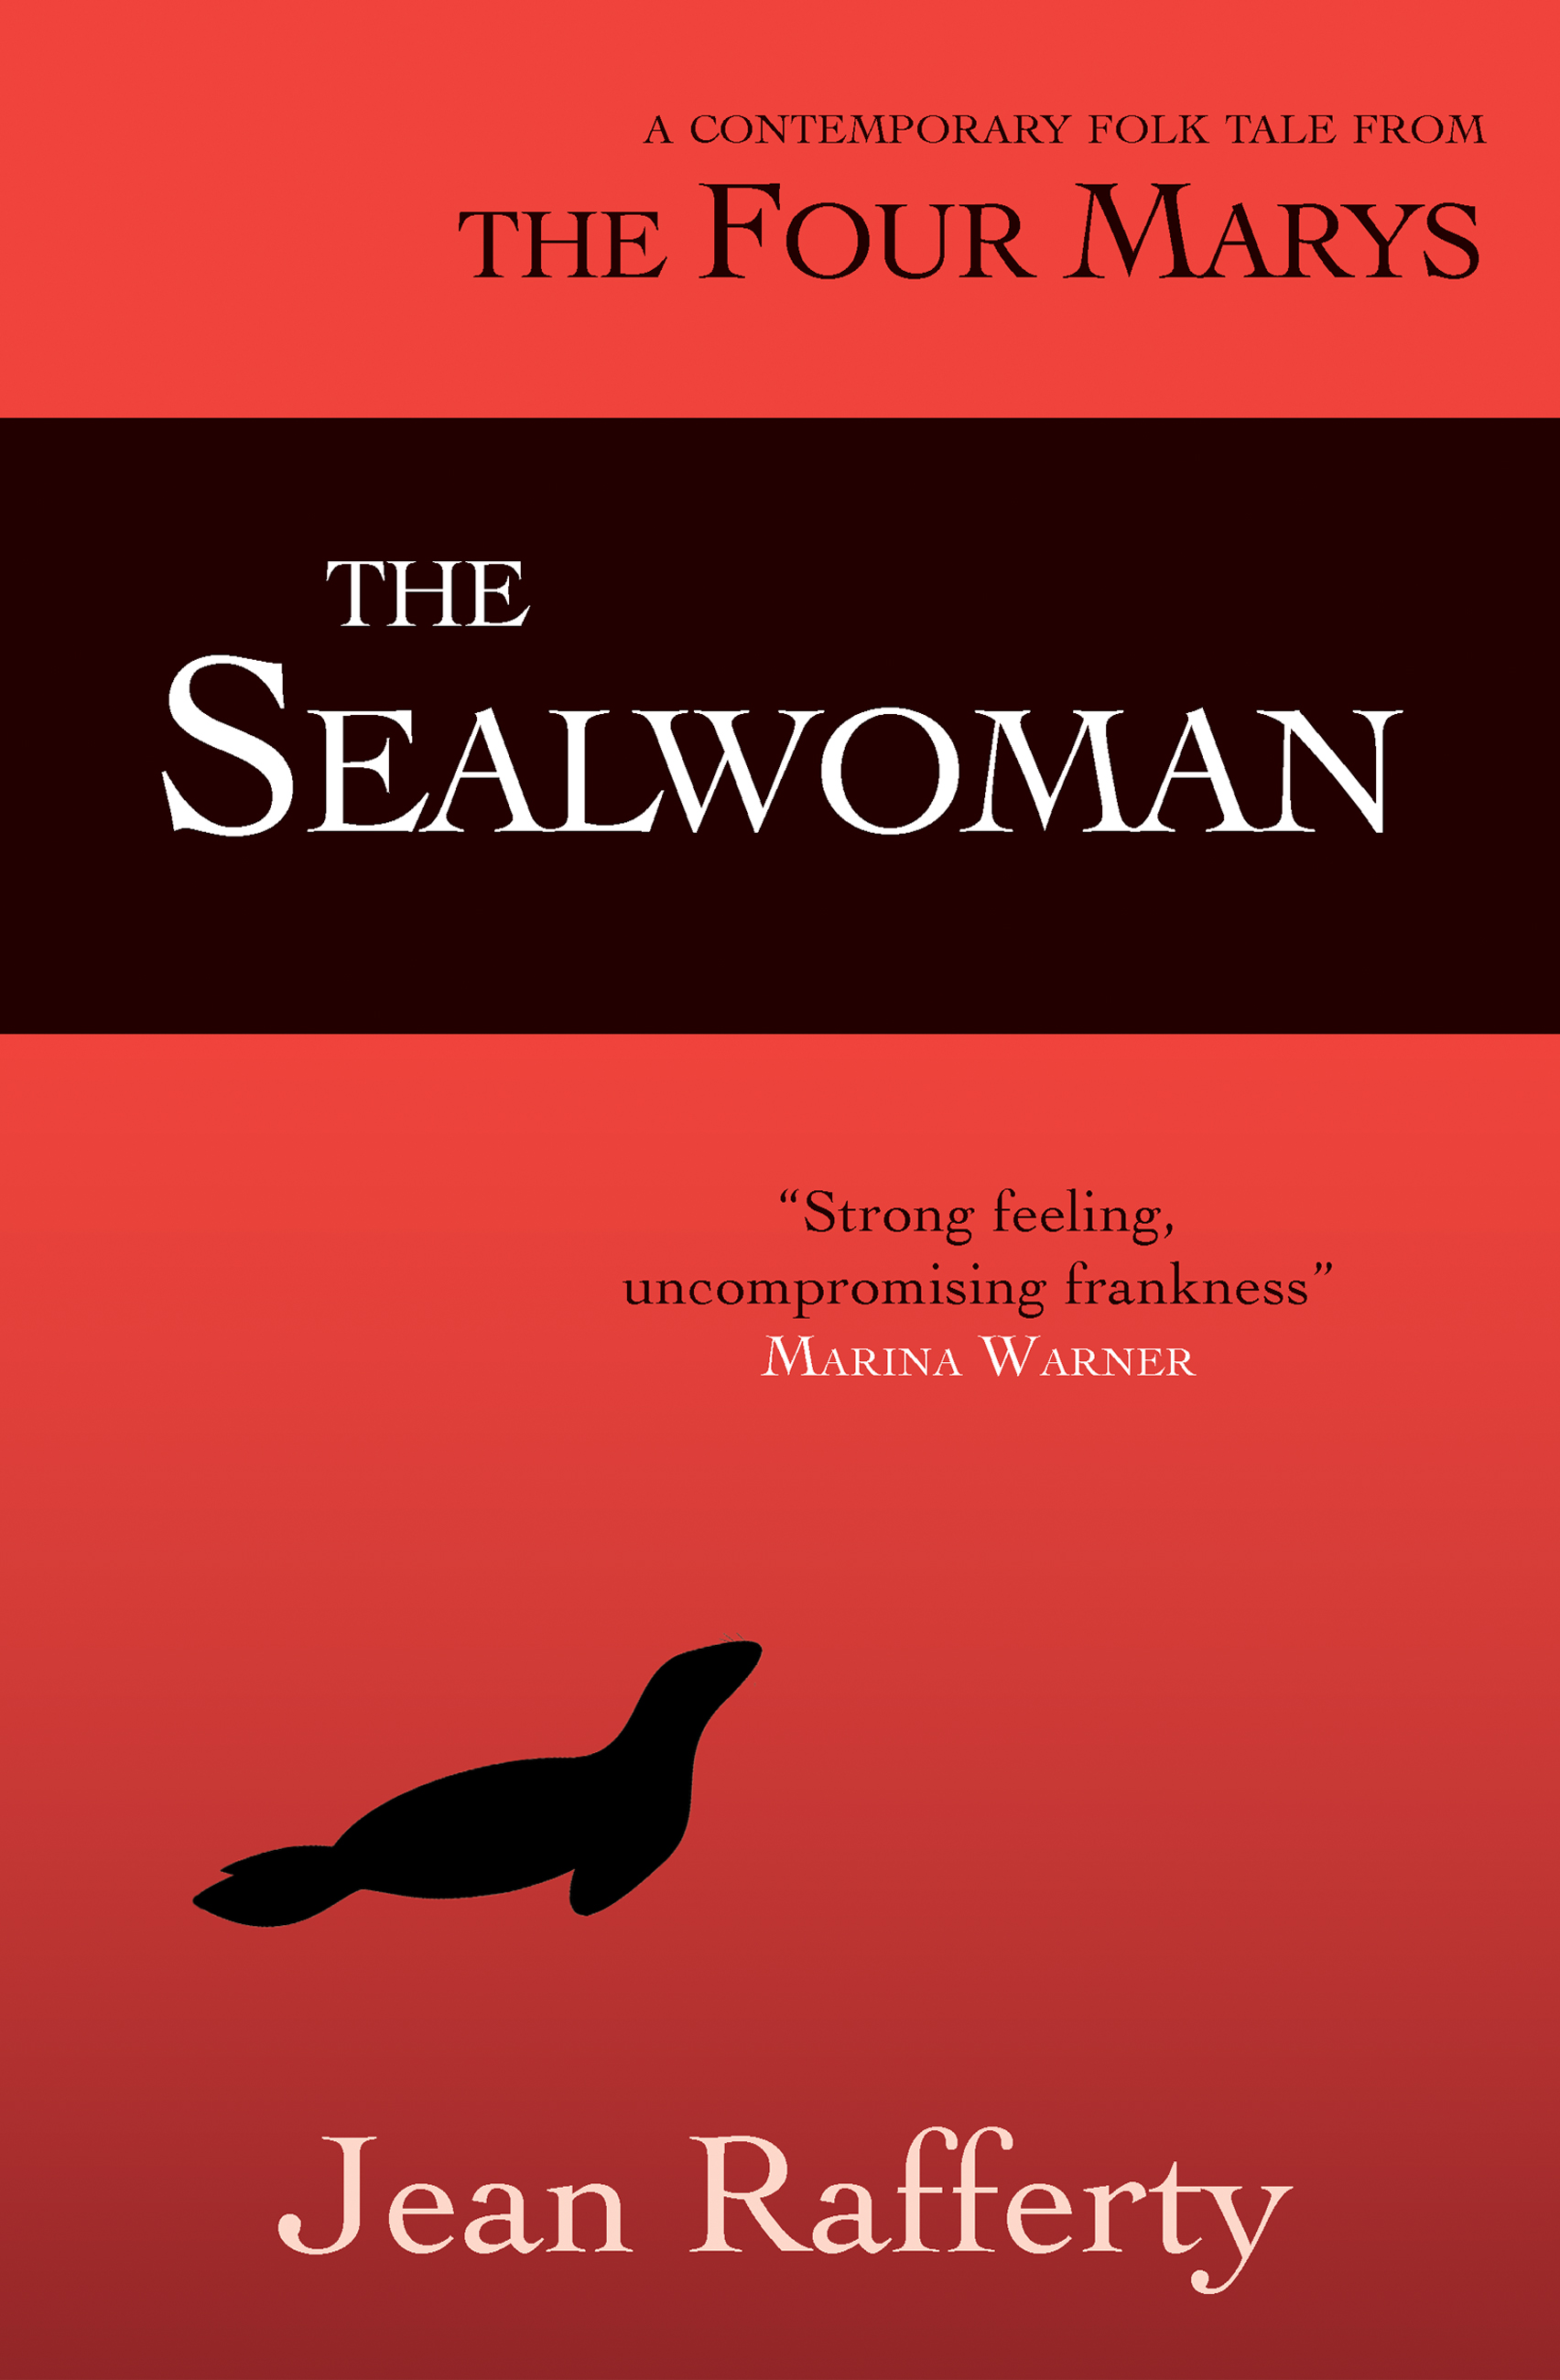 The Sealwoman